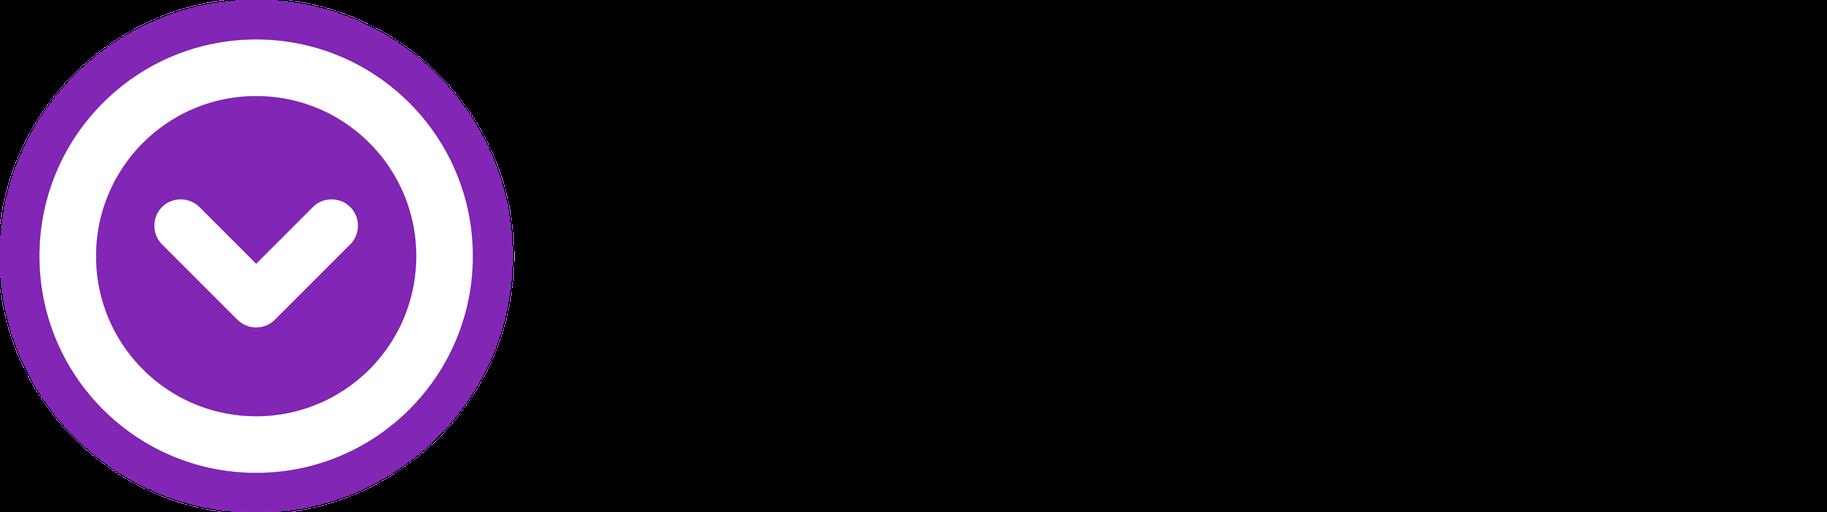 Single Music logo